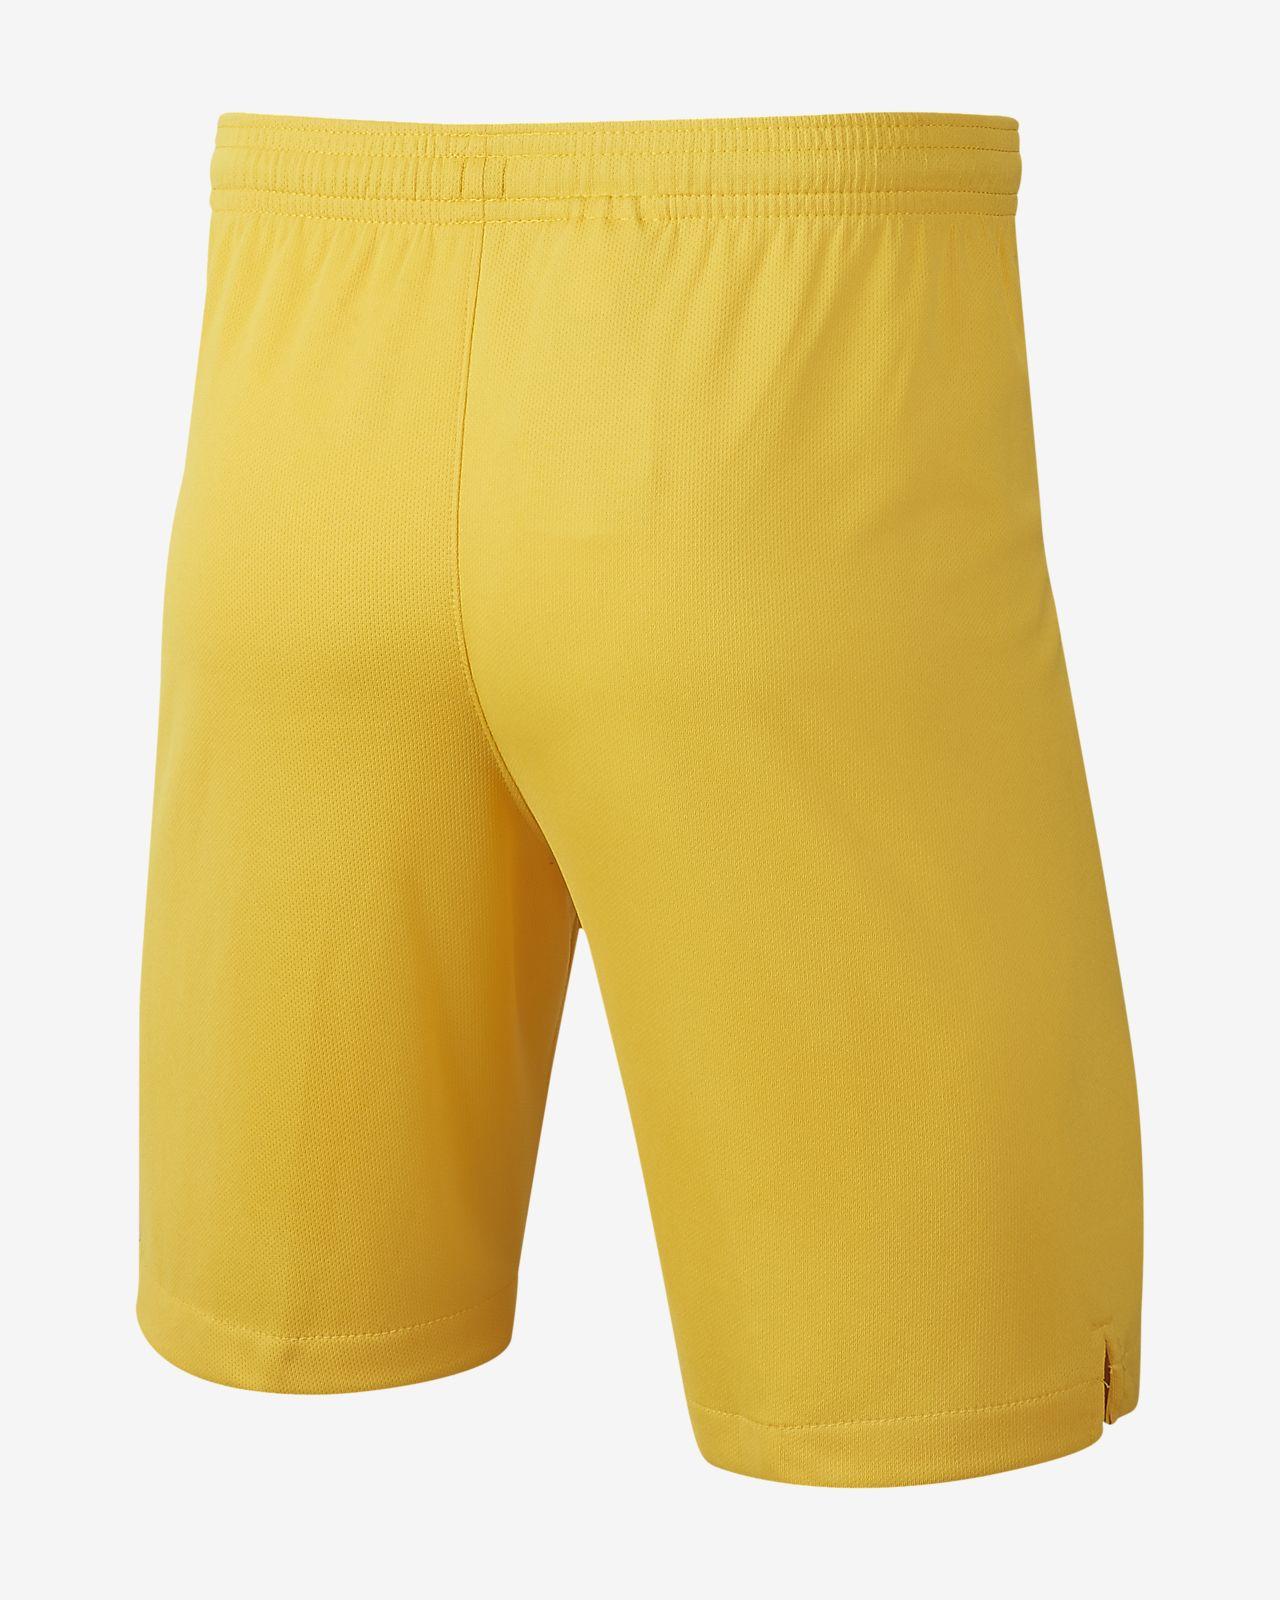 432d55208ae FC Barcelona 2019/20 Stadium Home/Away Older Kids' Football Shorts